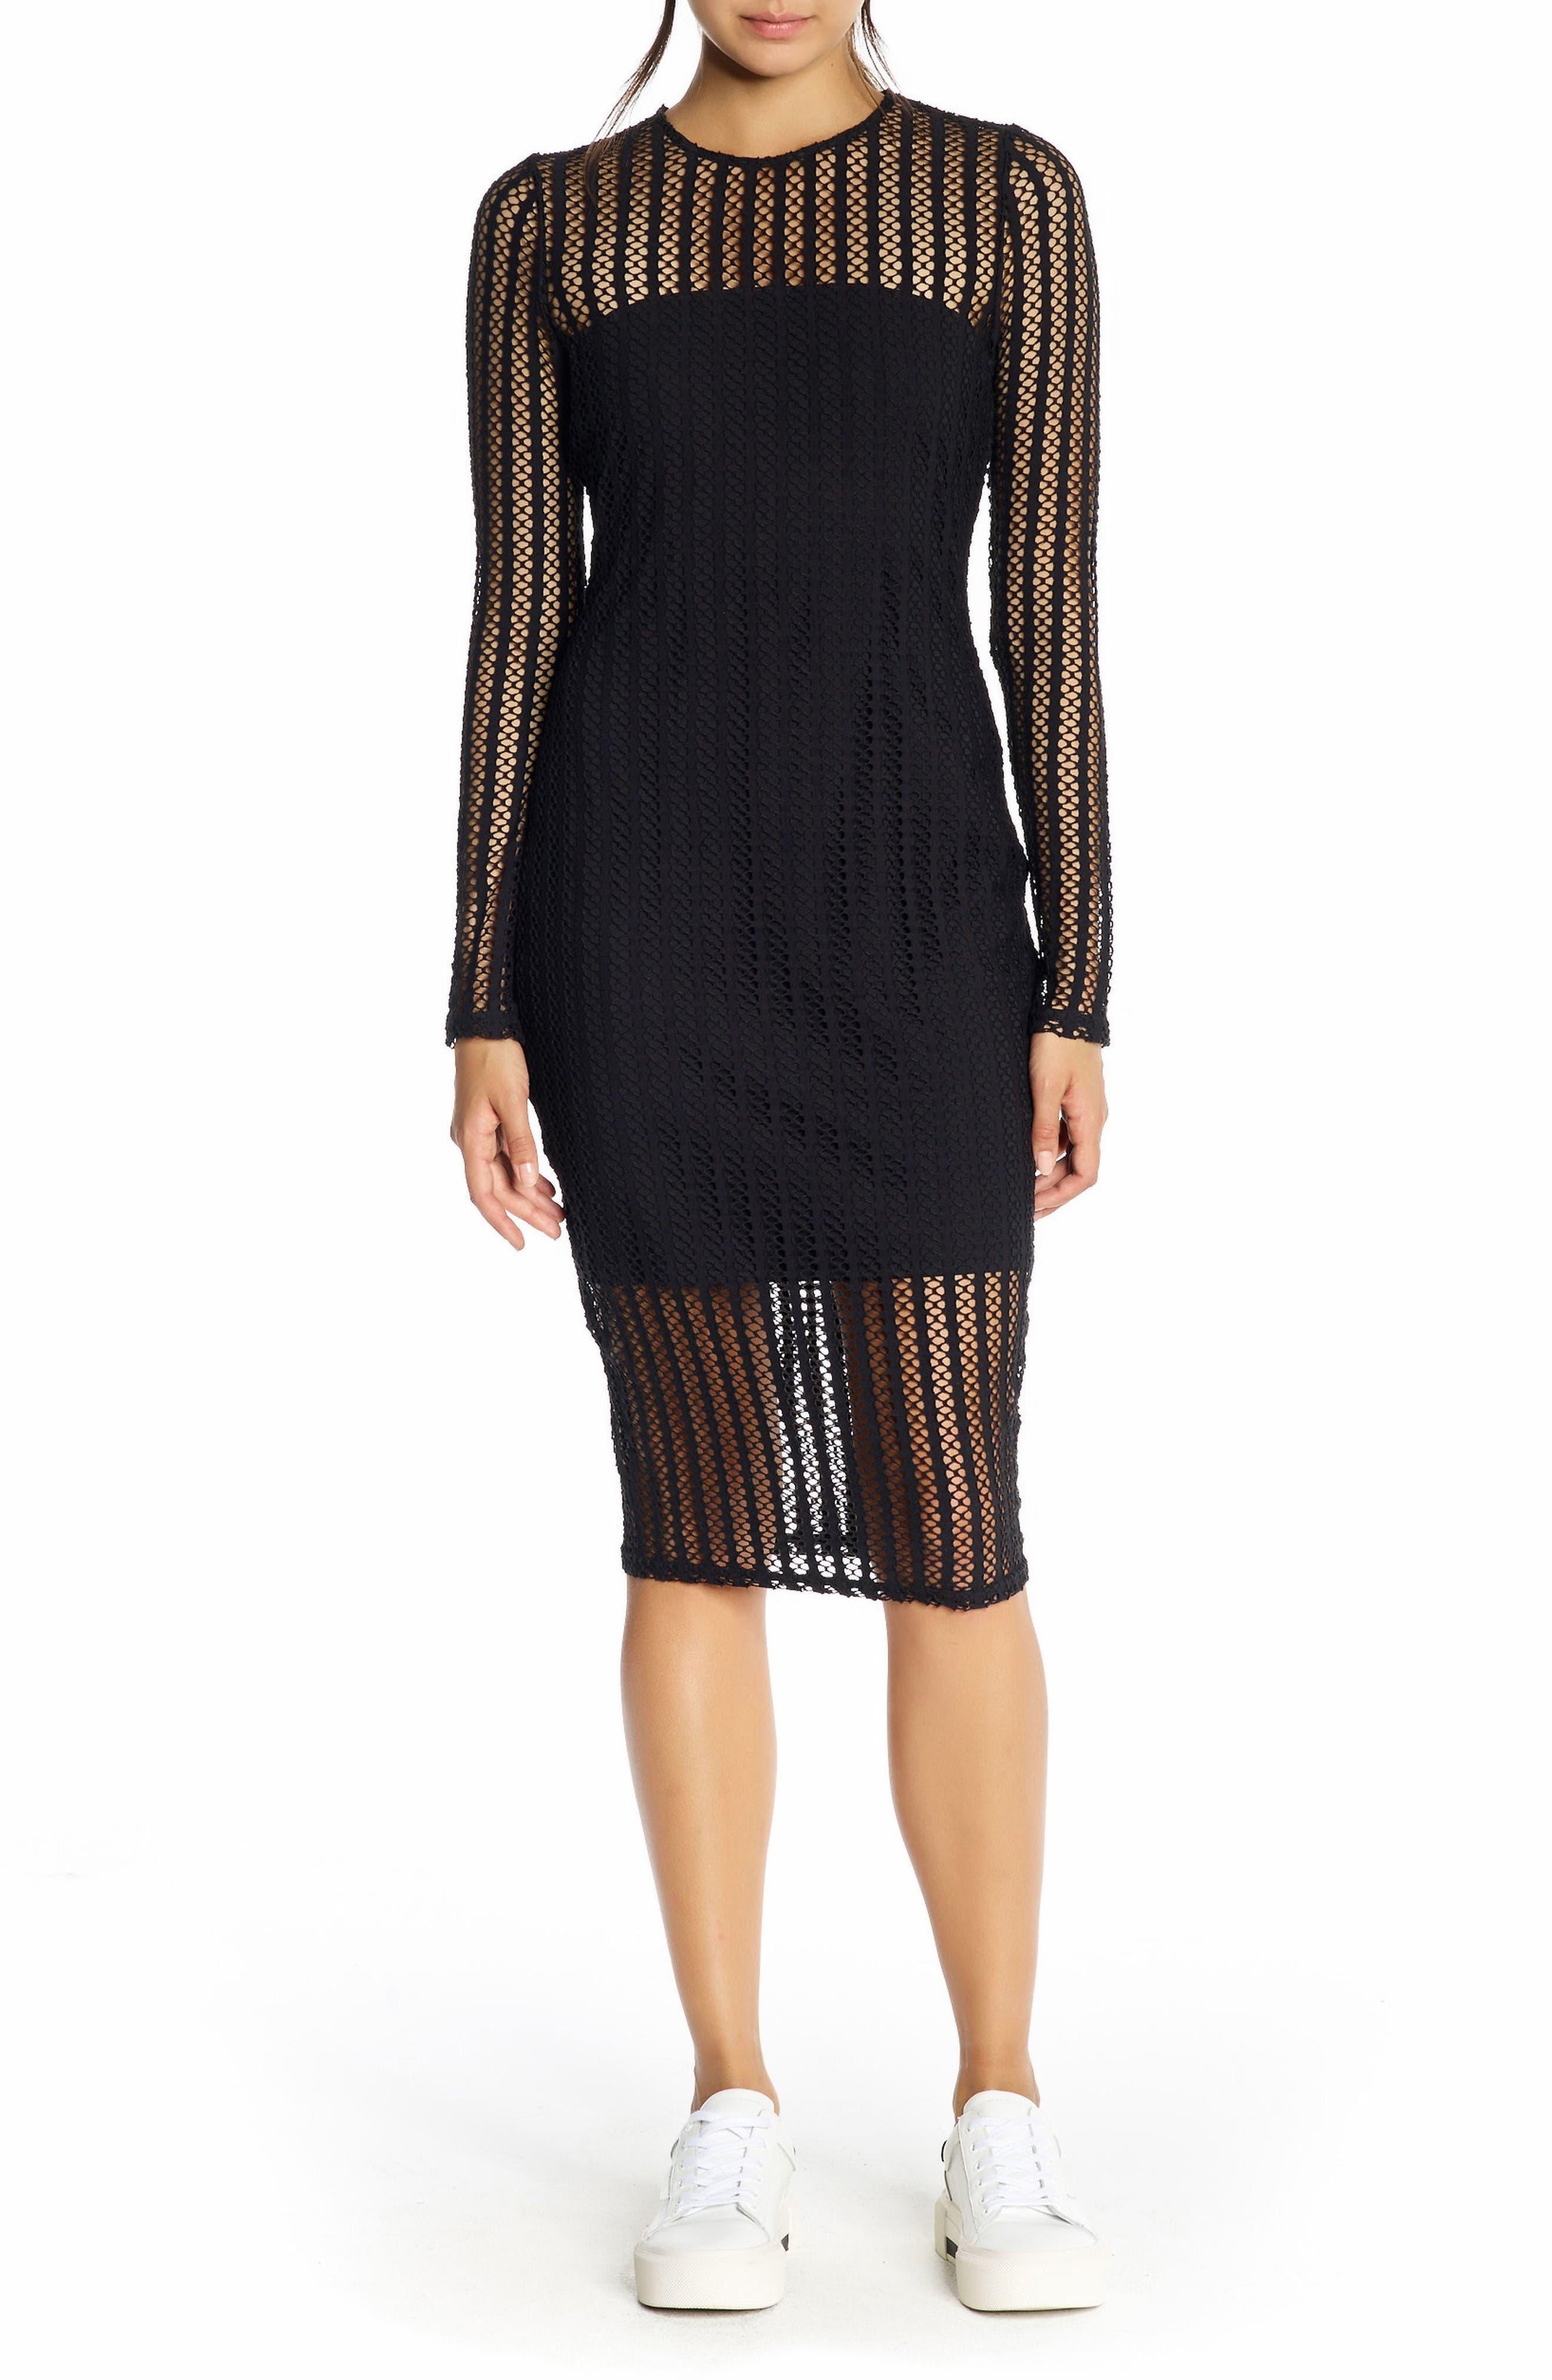 KENDALL + KYLIE Lattice Jersey Dress